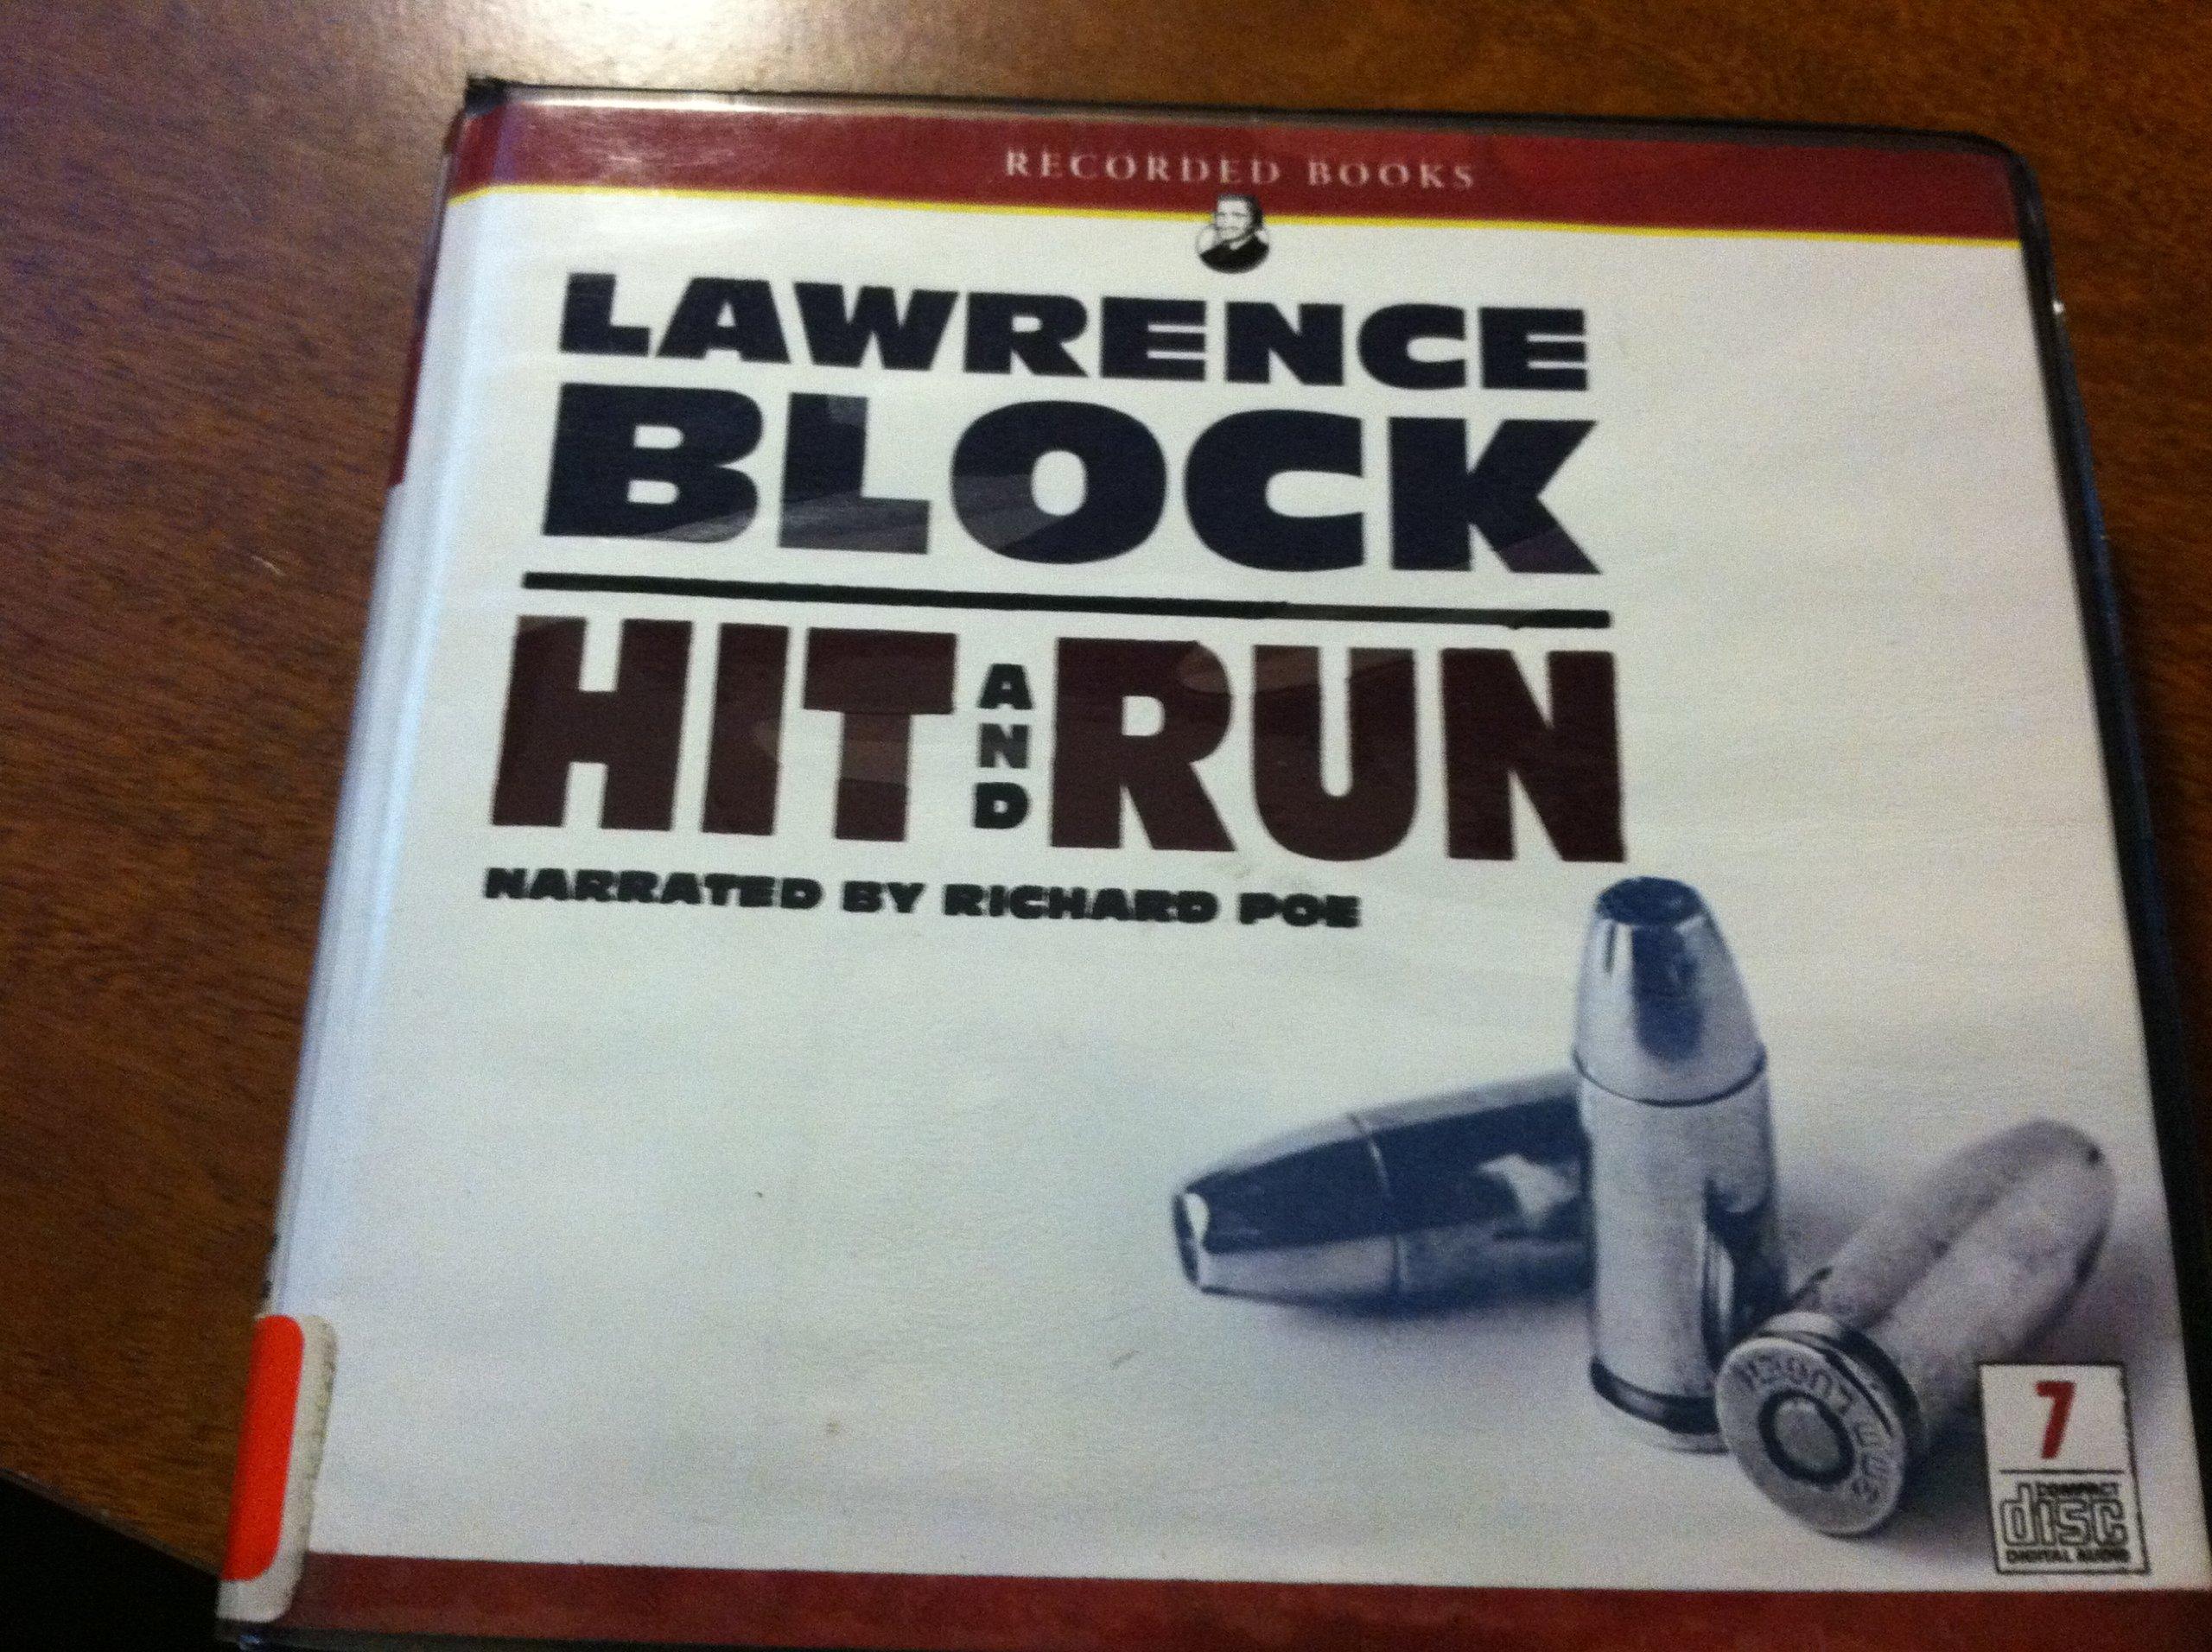 hit and run block lawrence